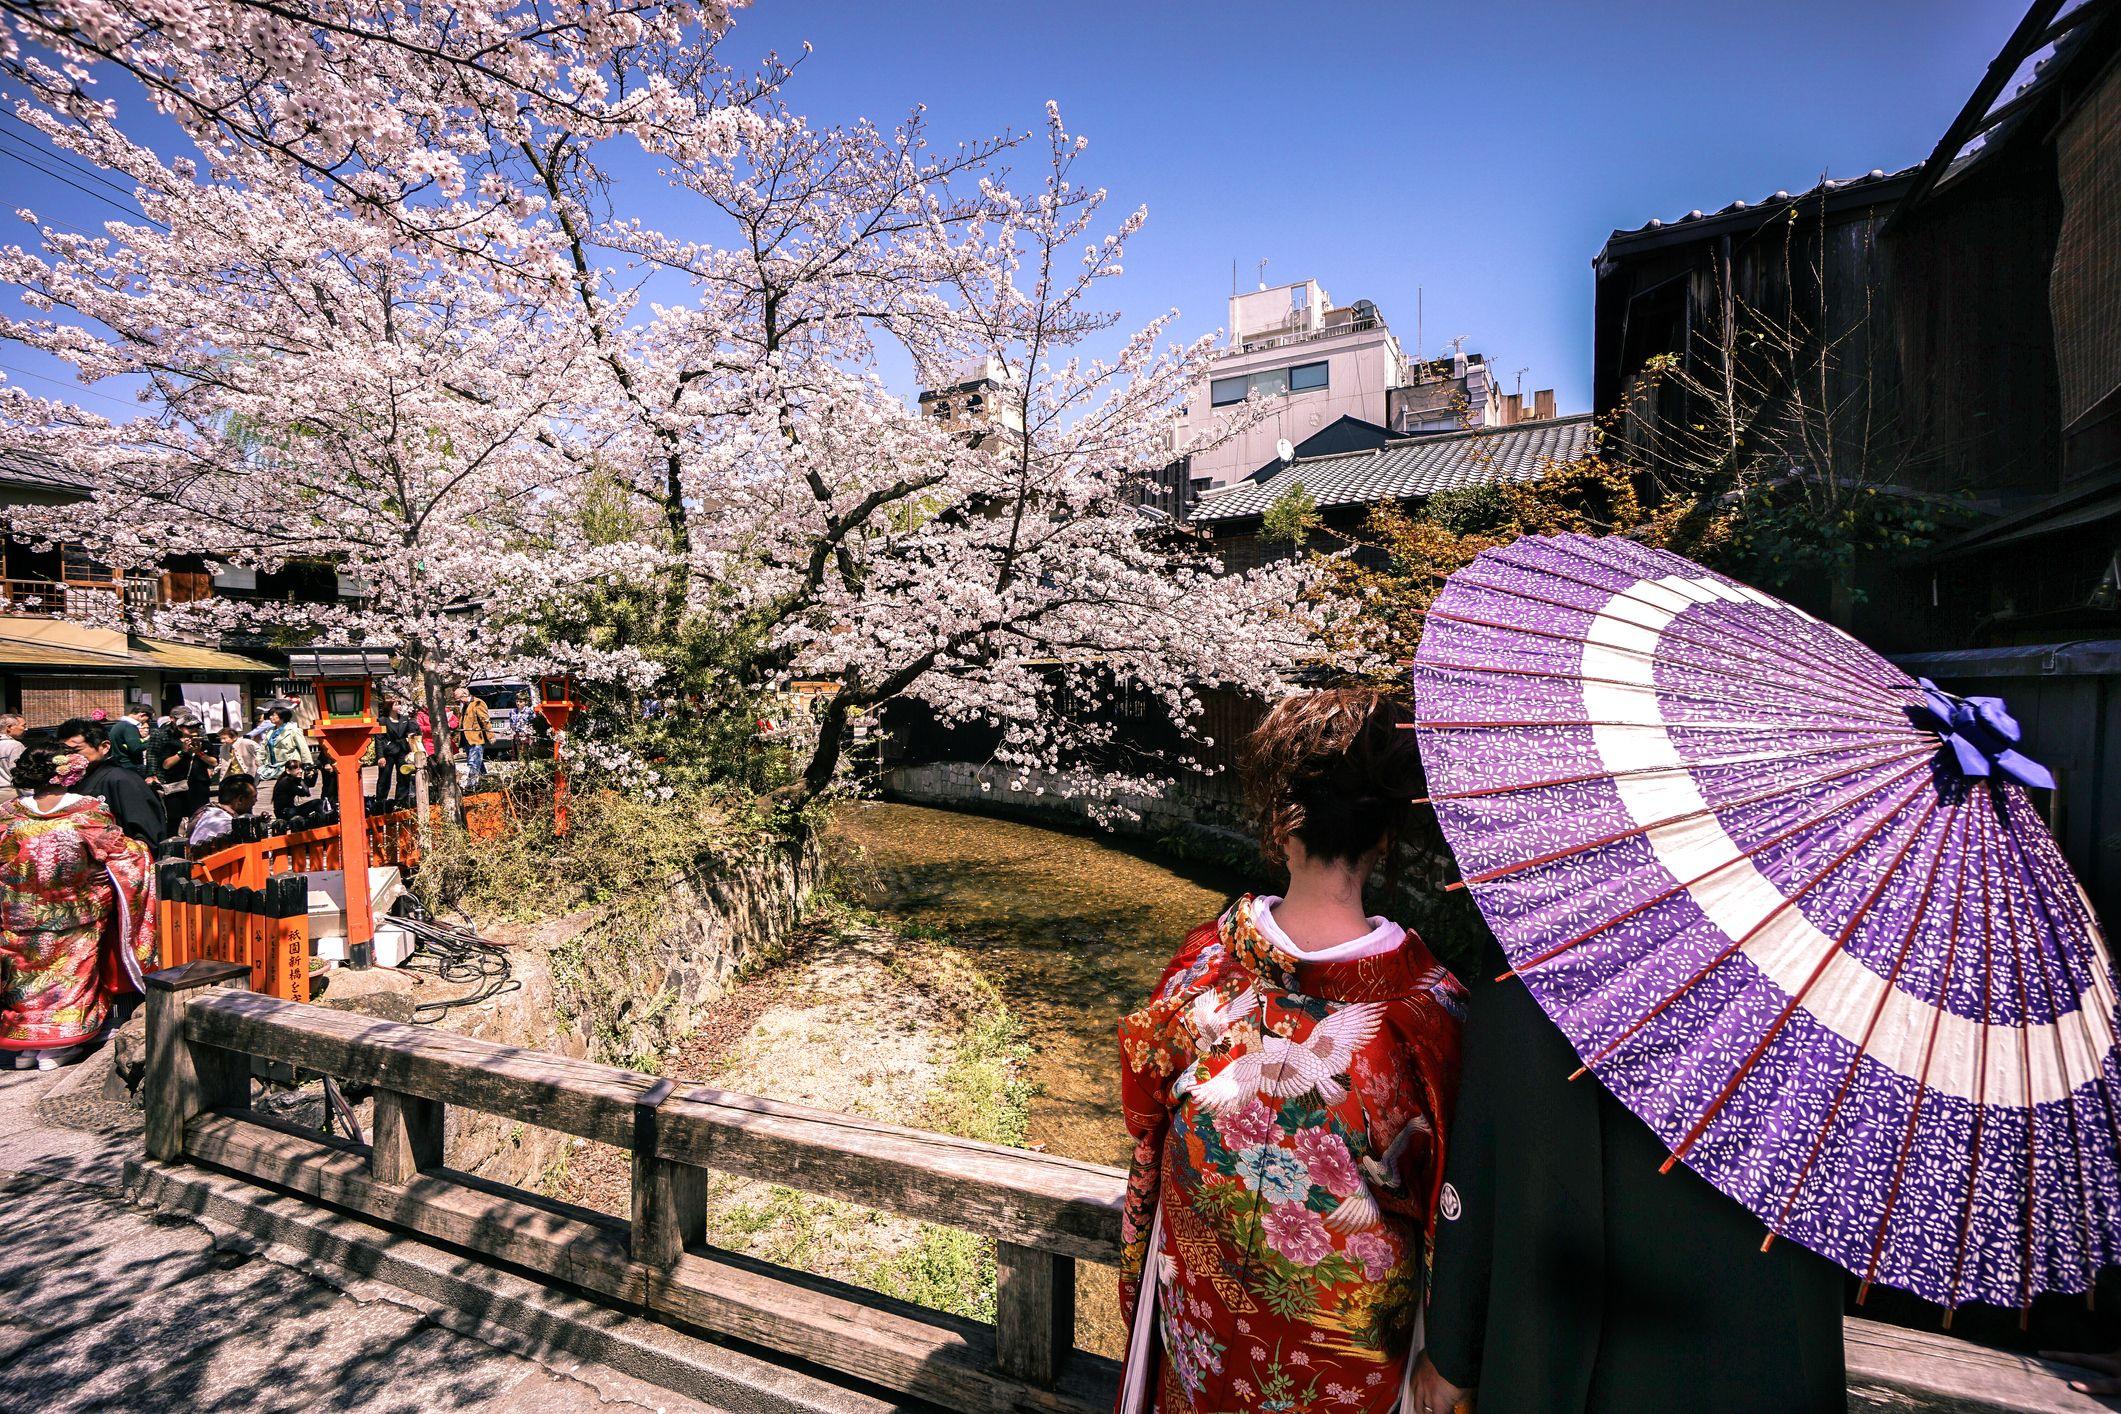 Japanese Couple Wearing Kimono Enjoying Cherry Blossoms in Gion Kyoto Japan